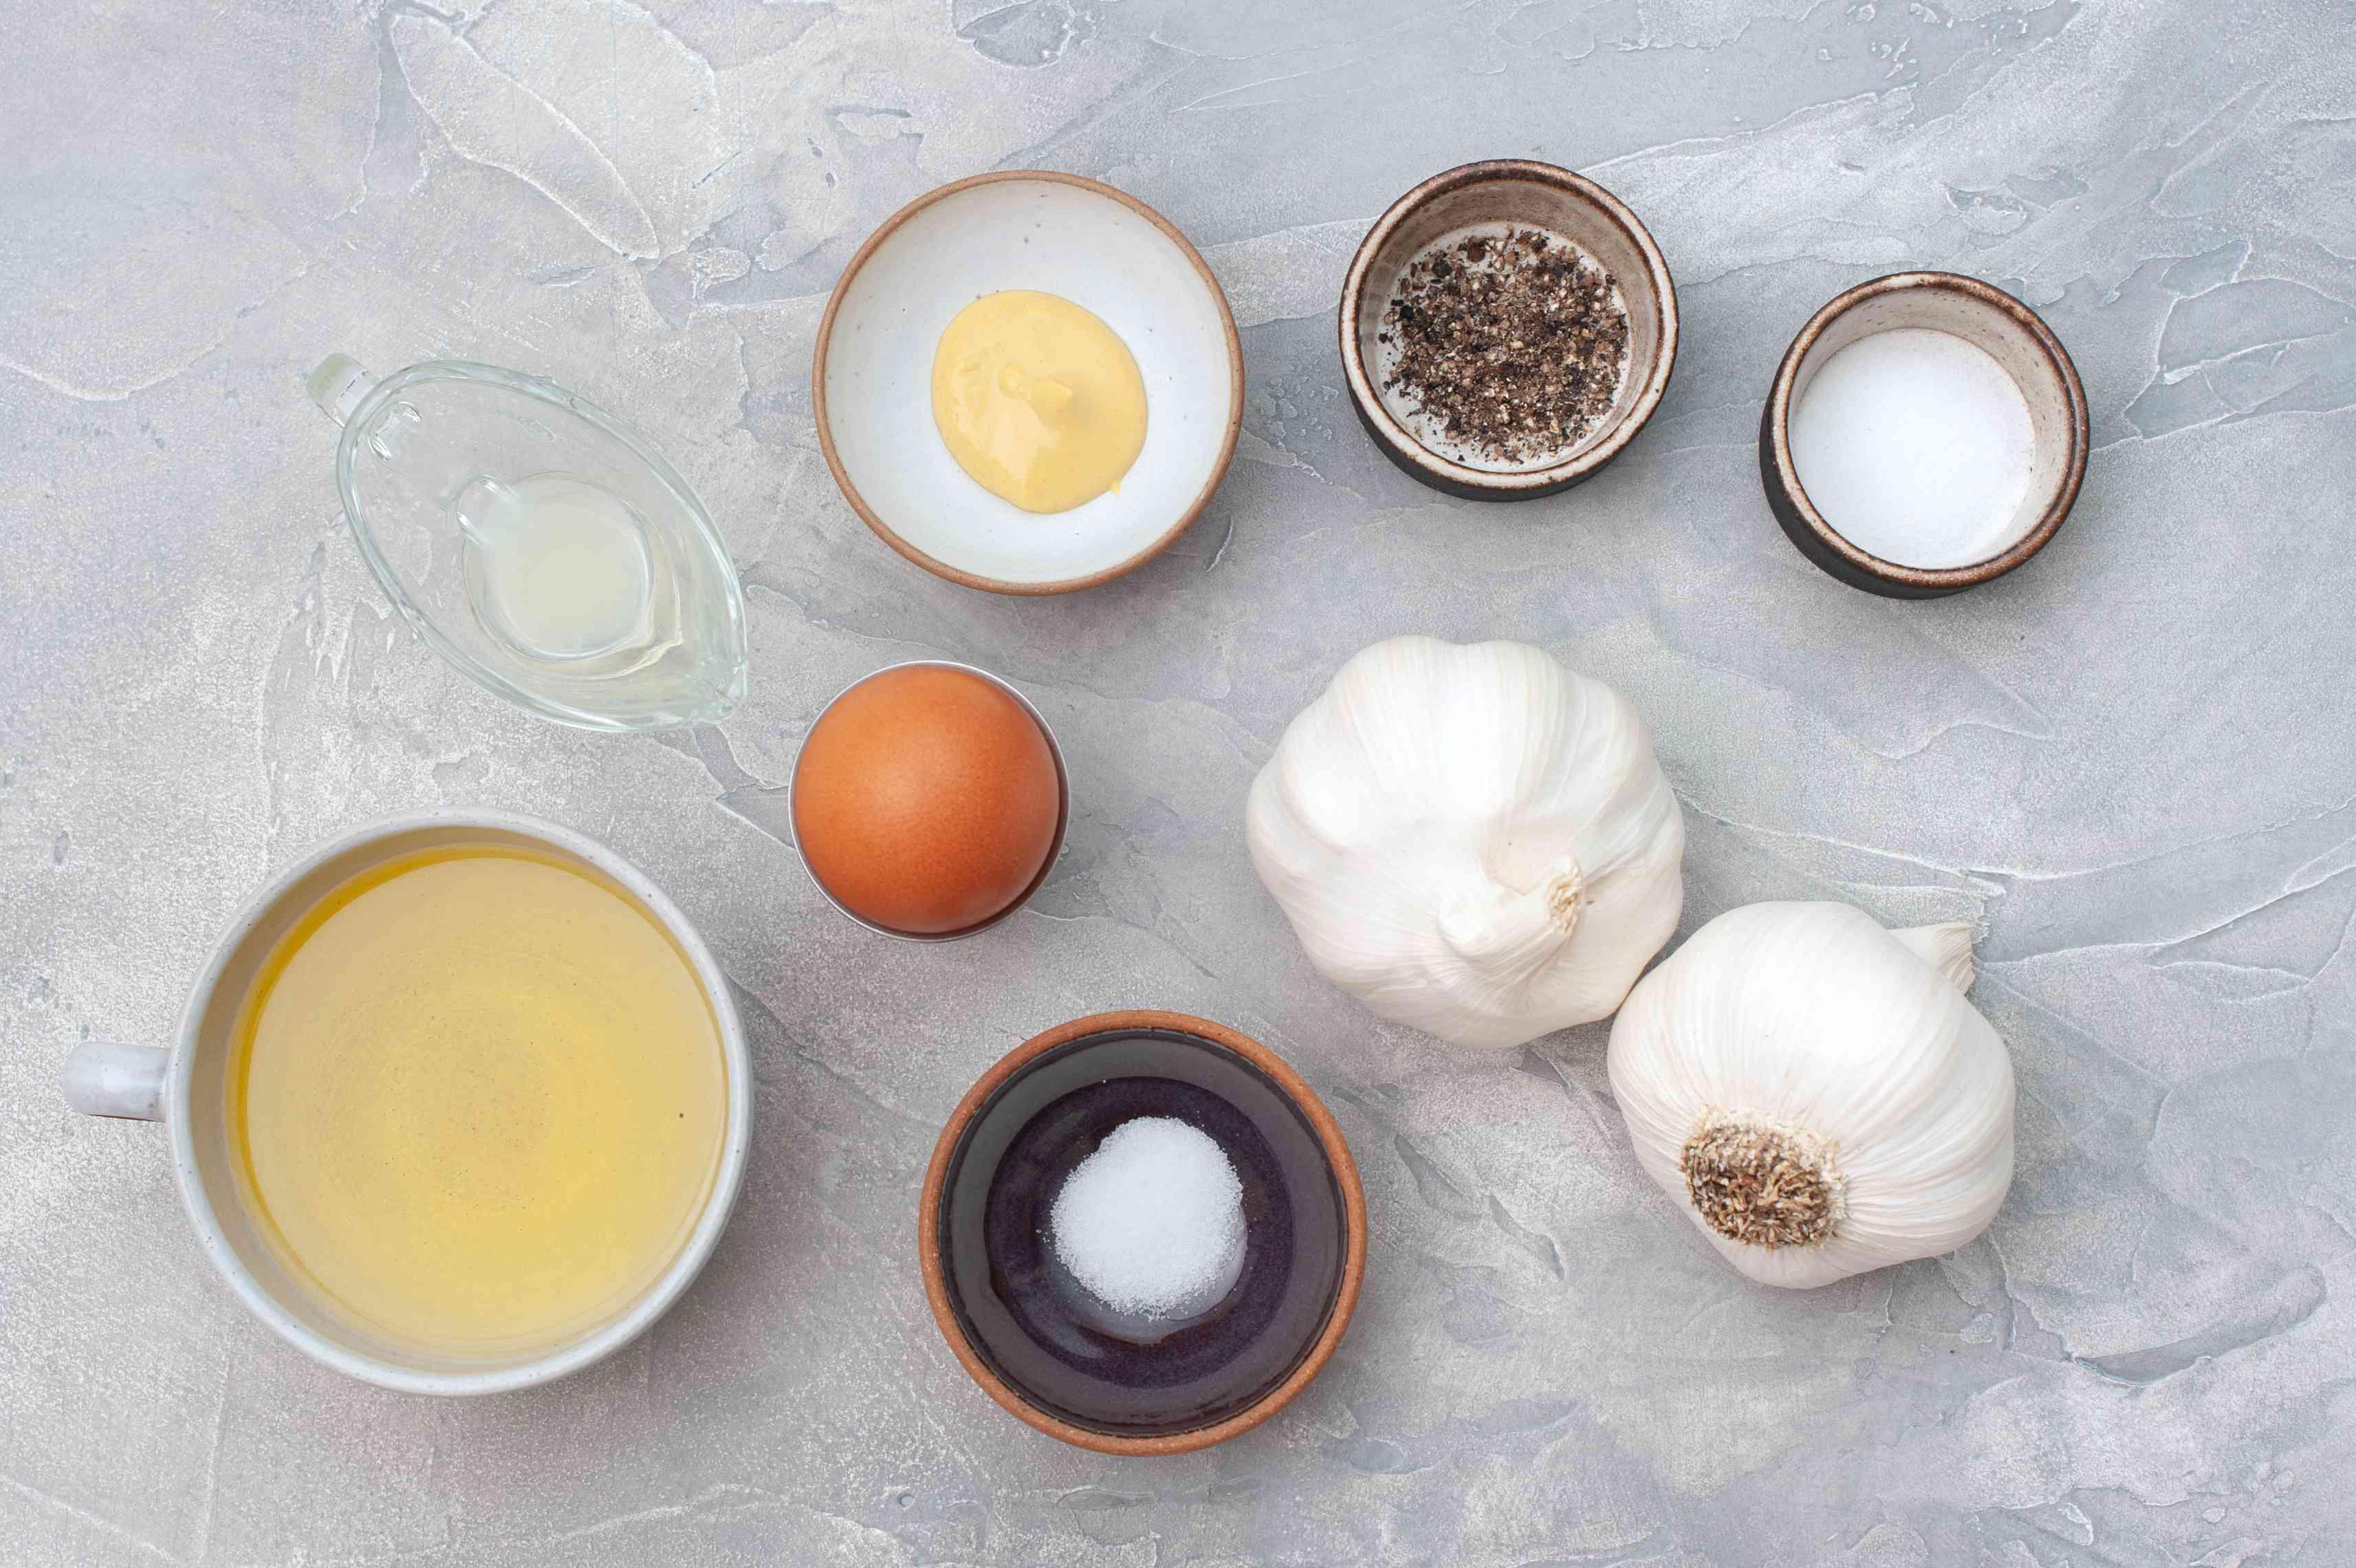 Ingredients for garlic aioli